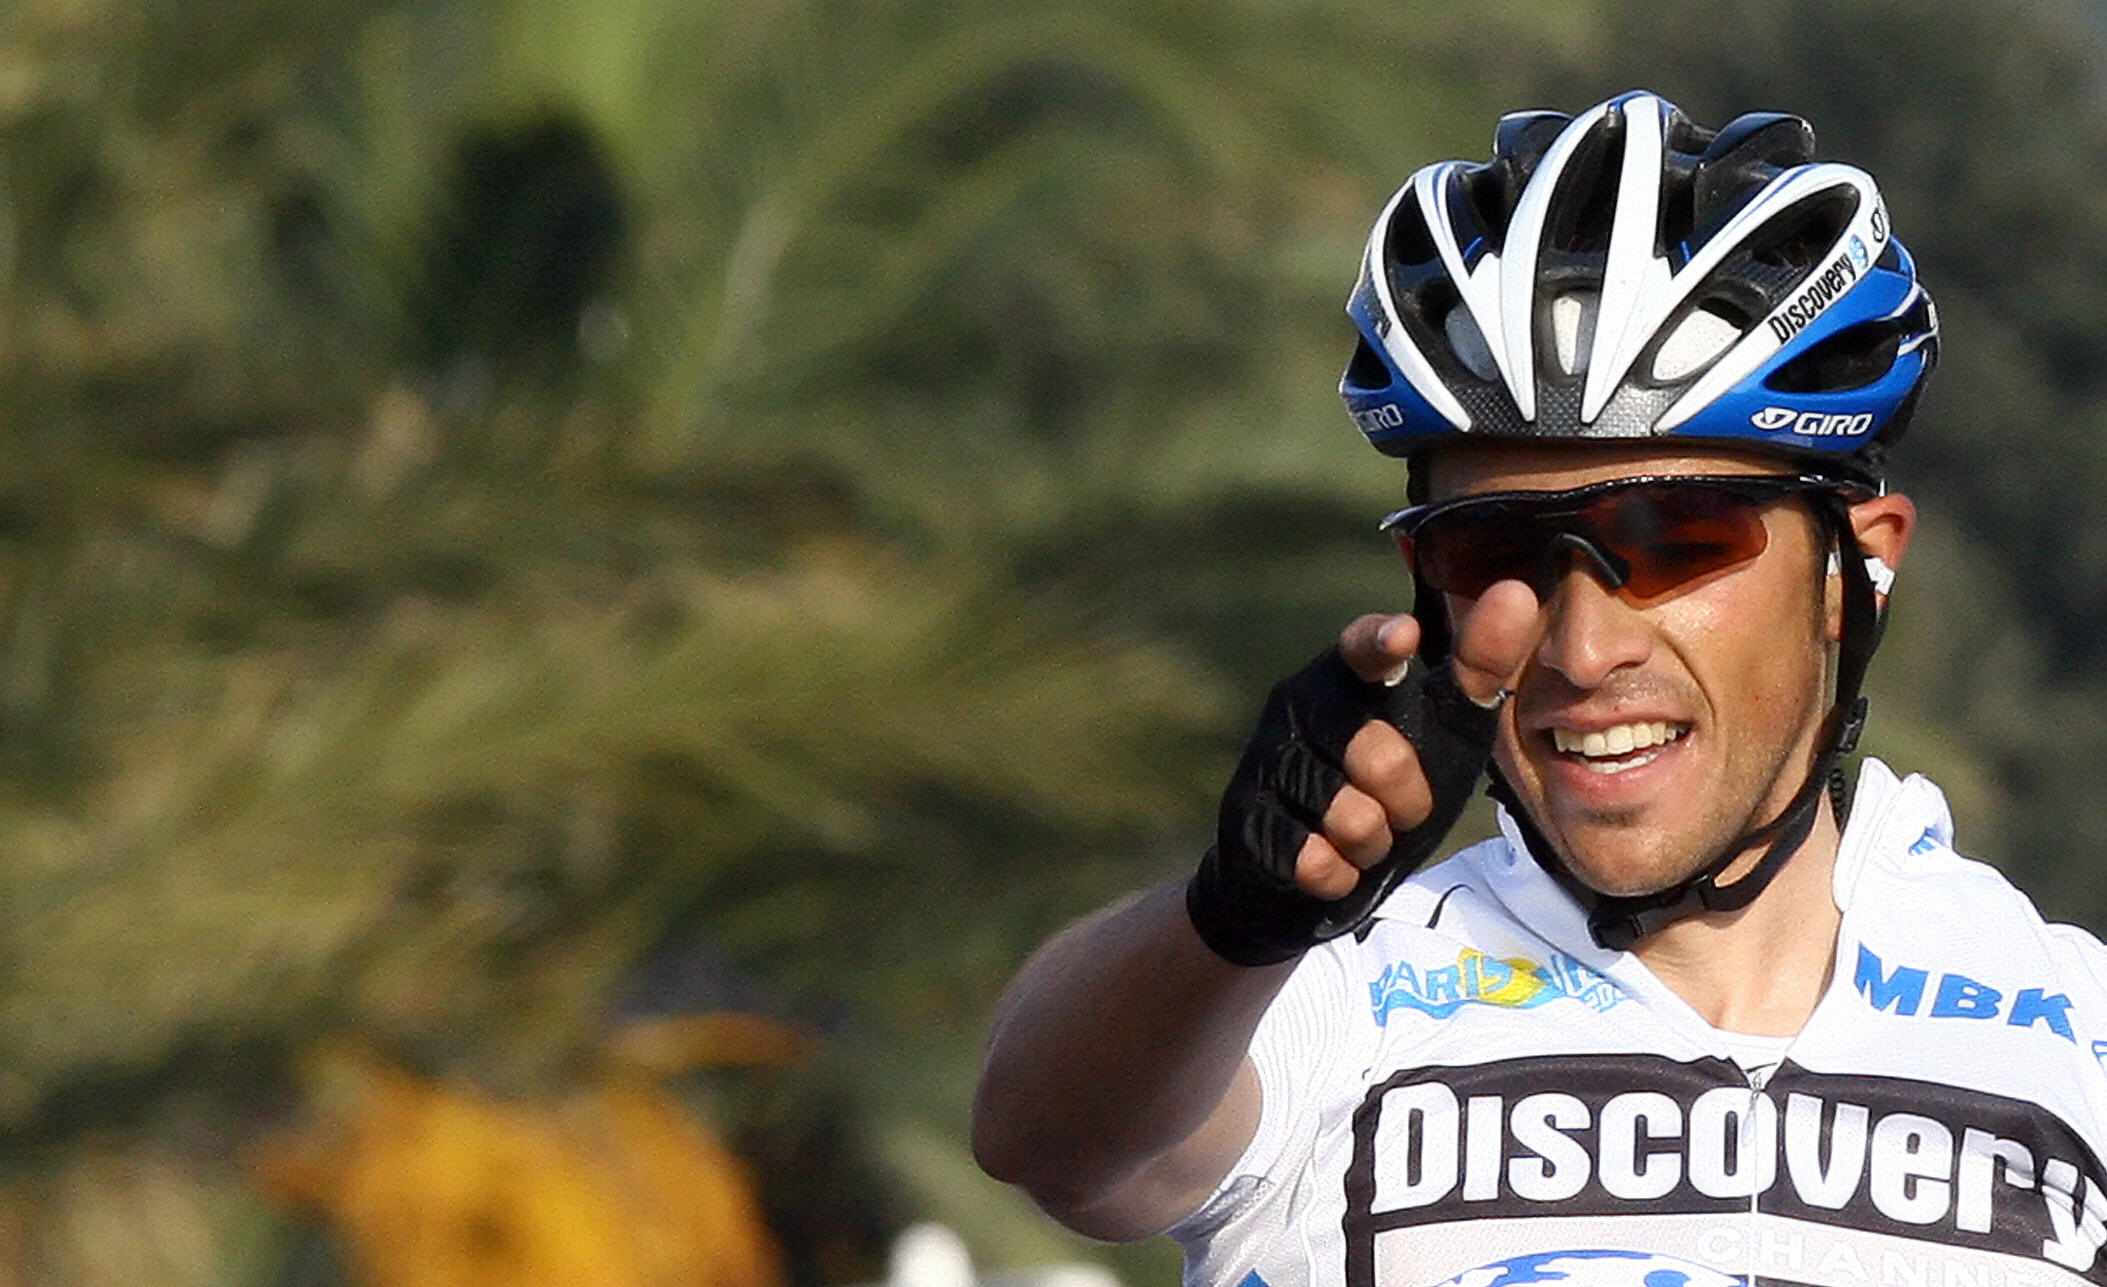 2007 Paris-Nice winner Alberto Contador